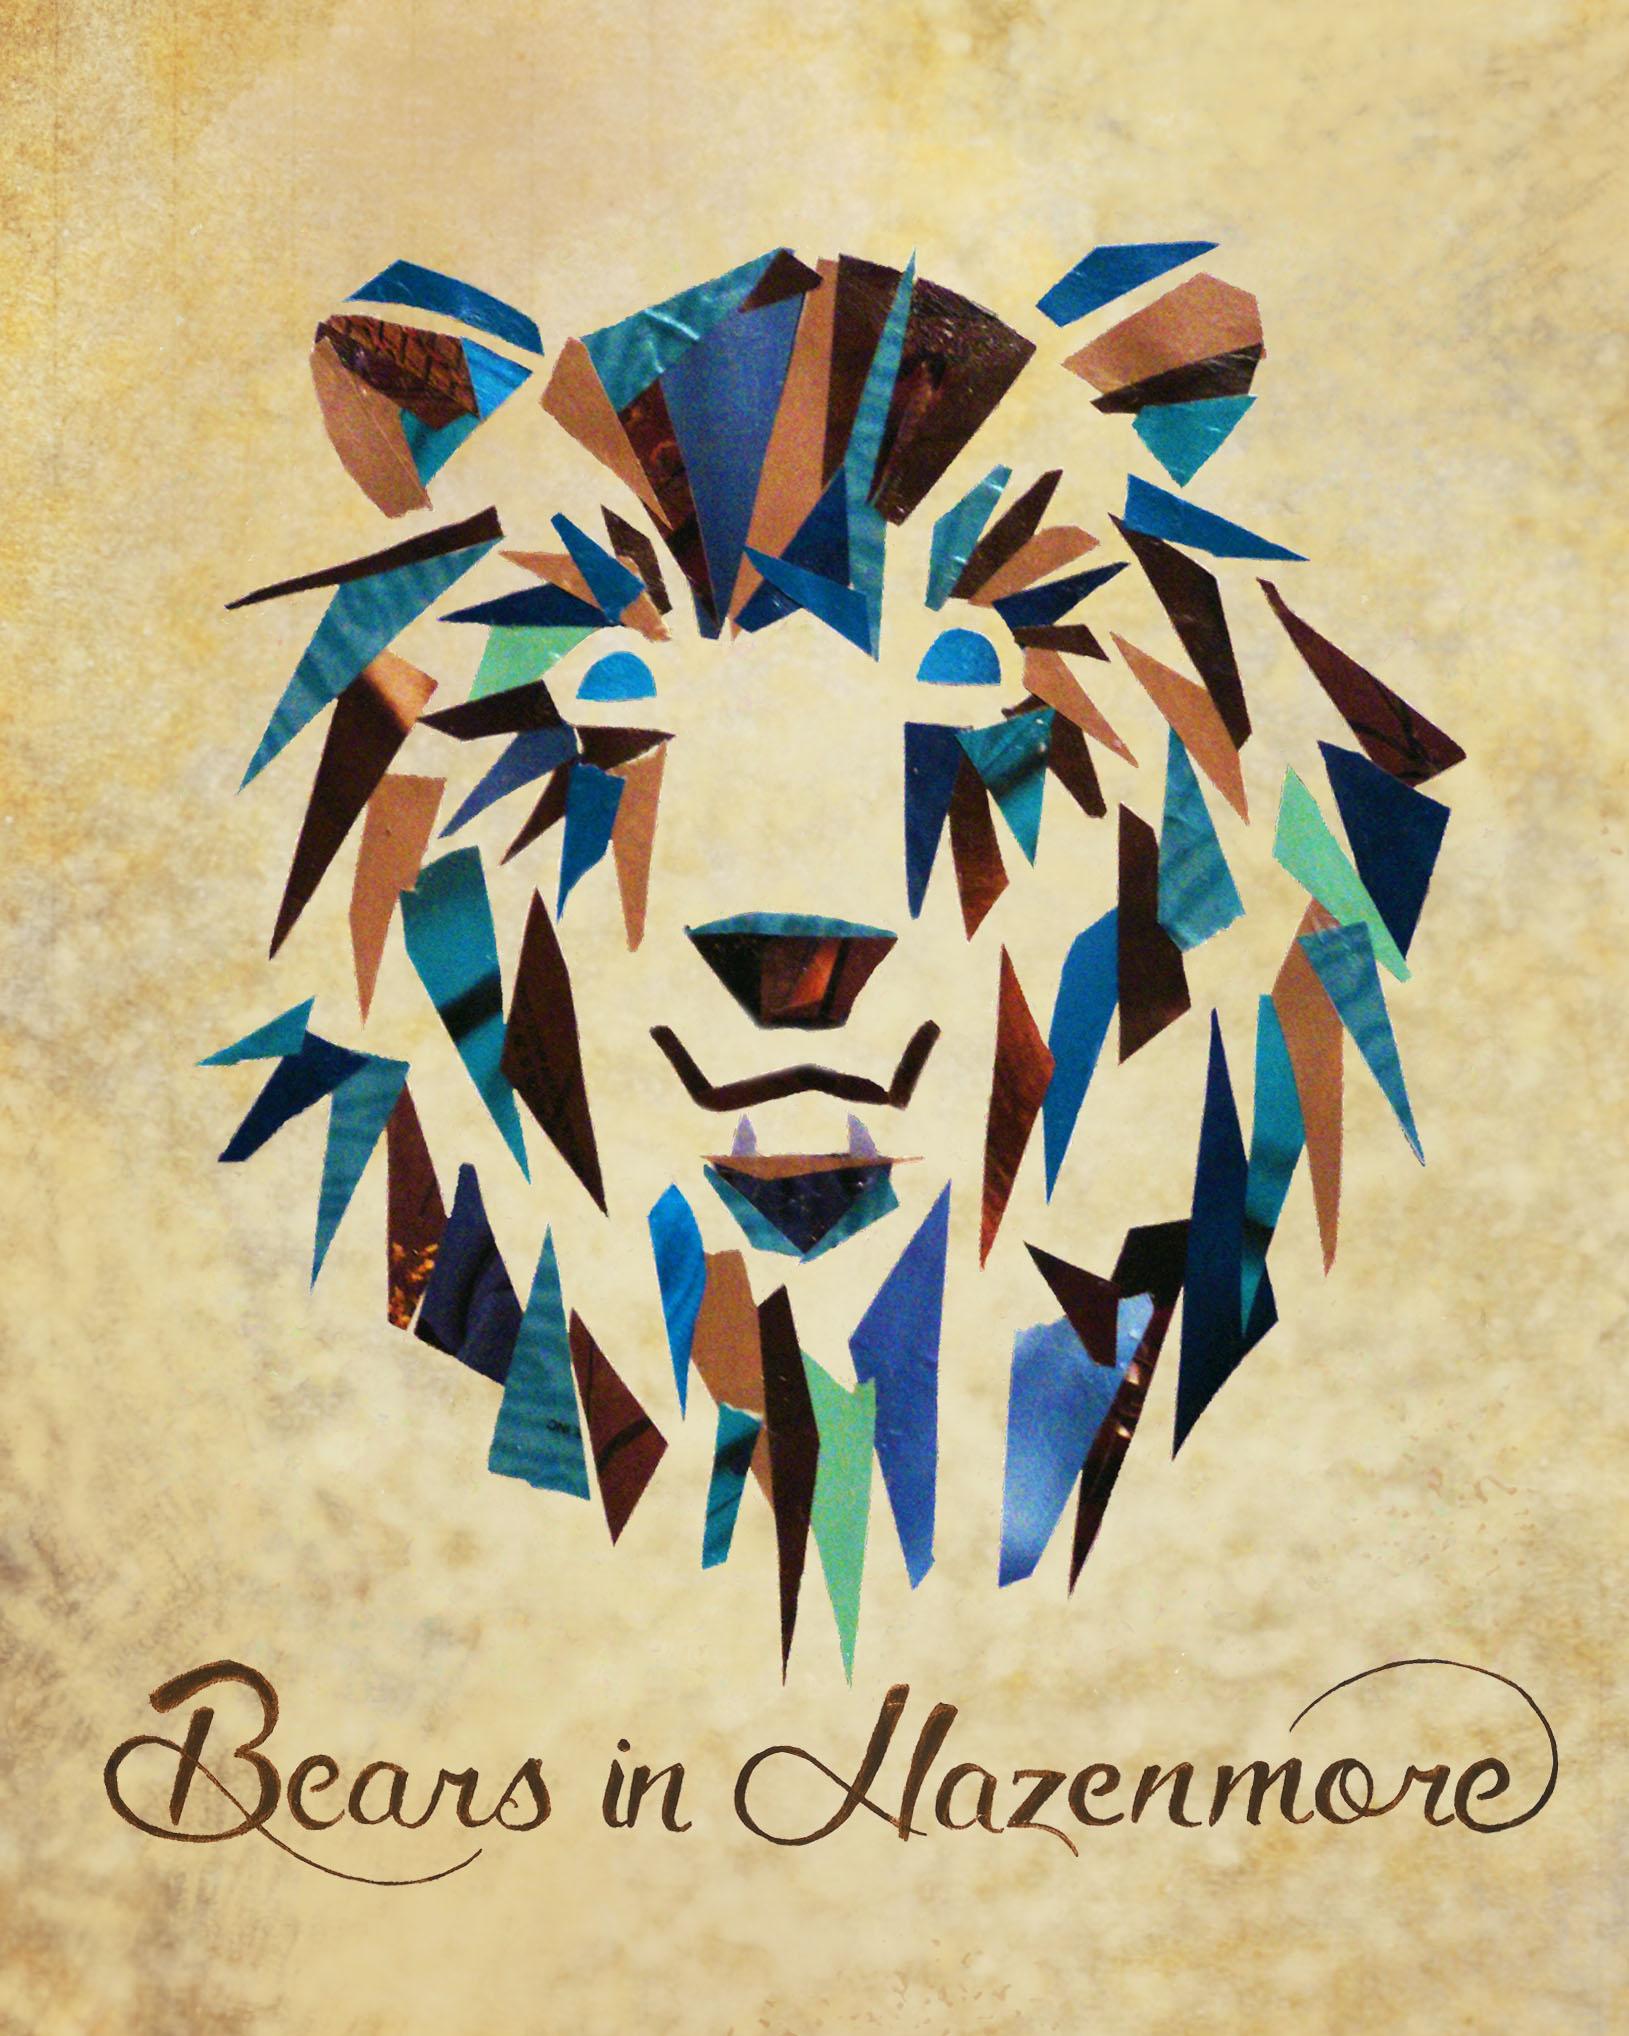 Bears in Hazenmore Collage Sticker